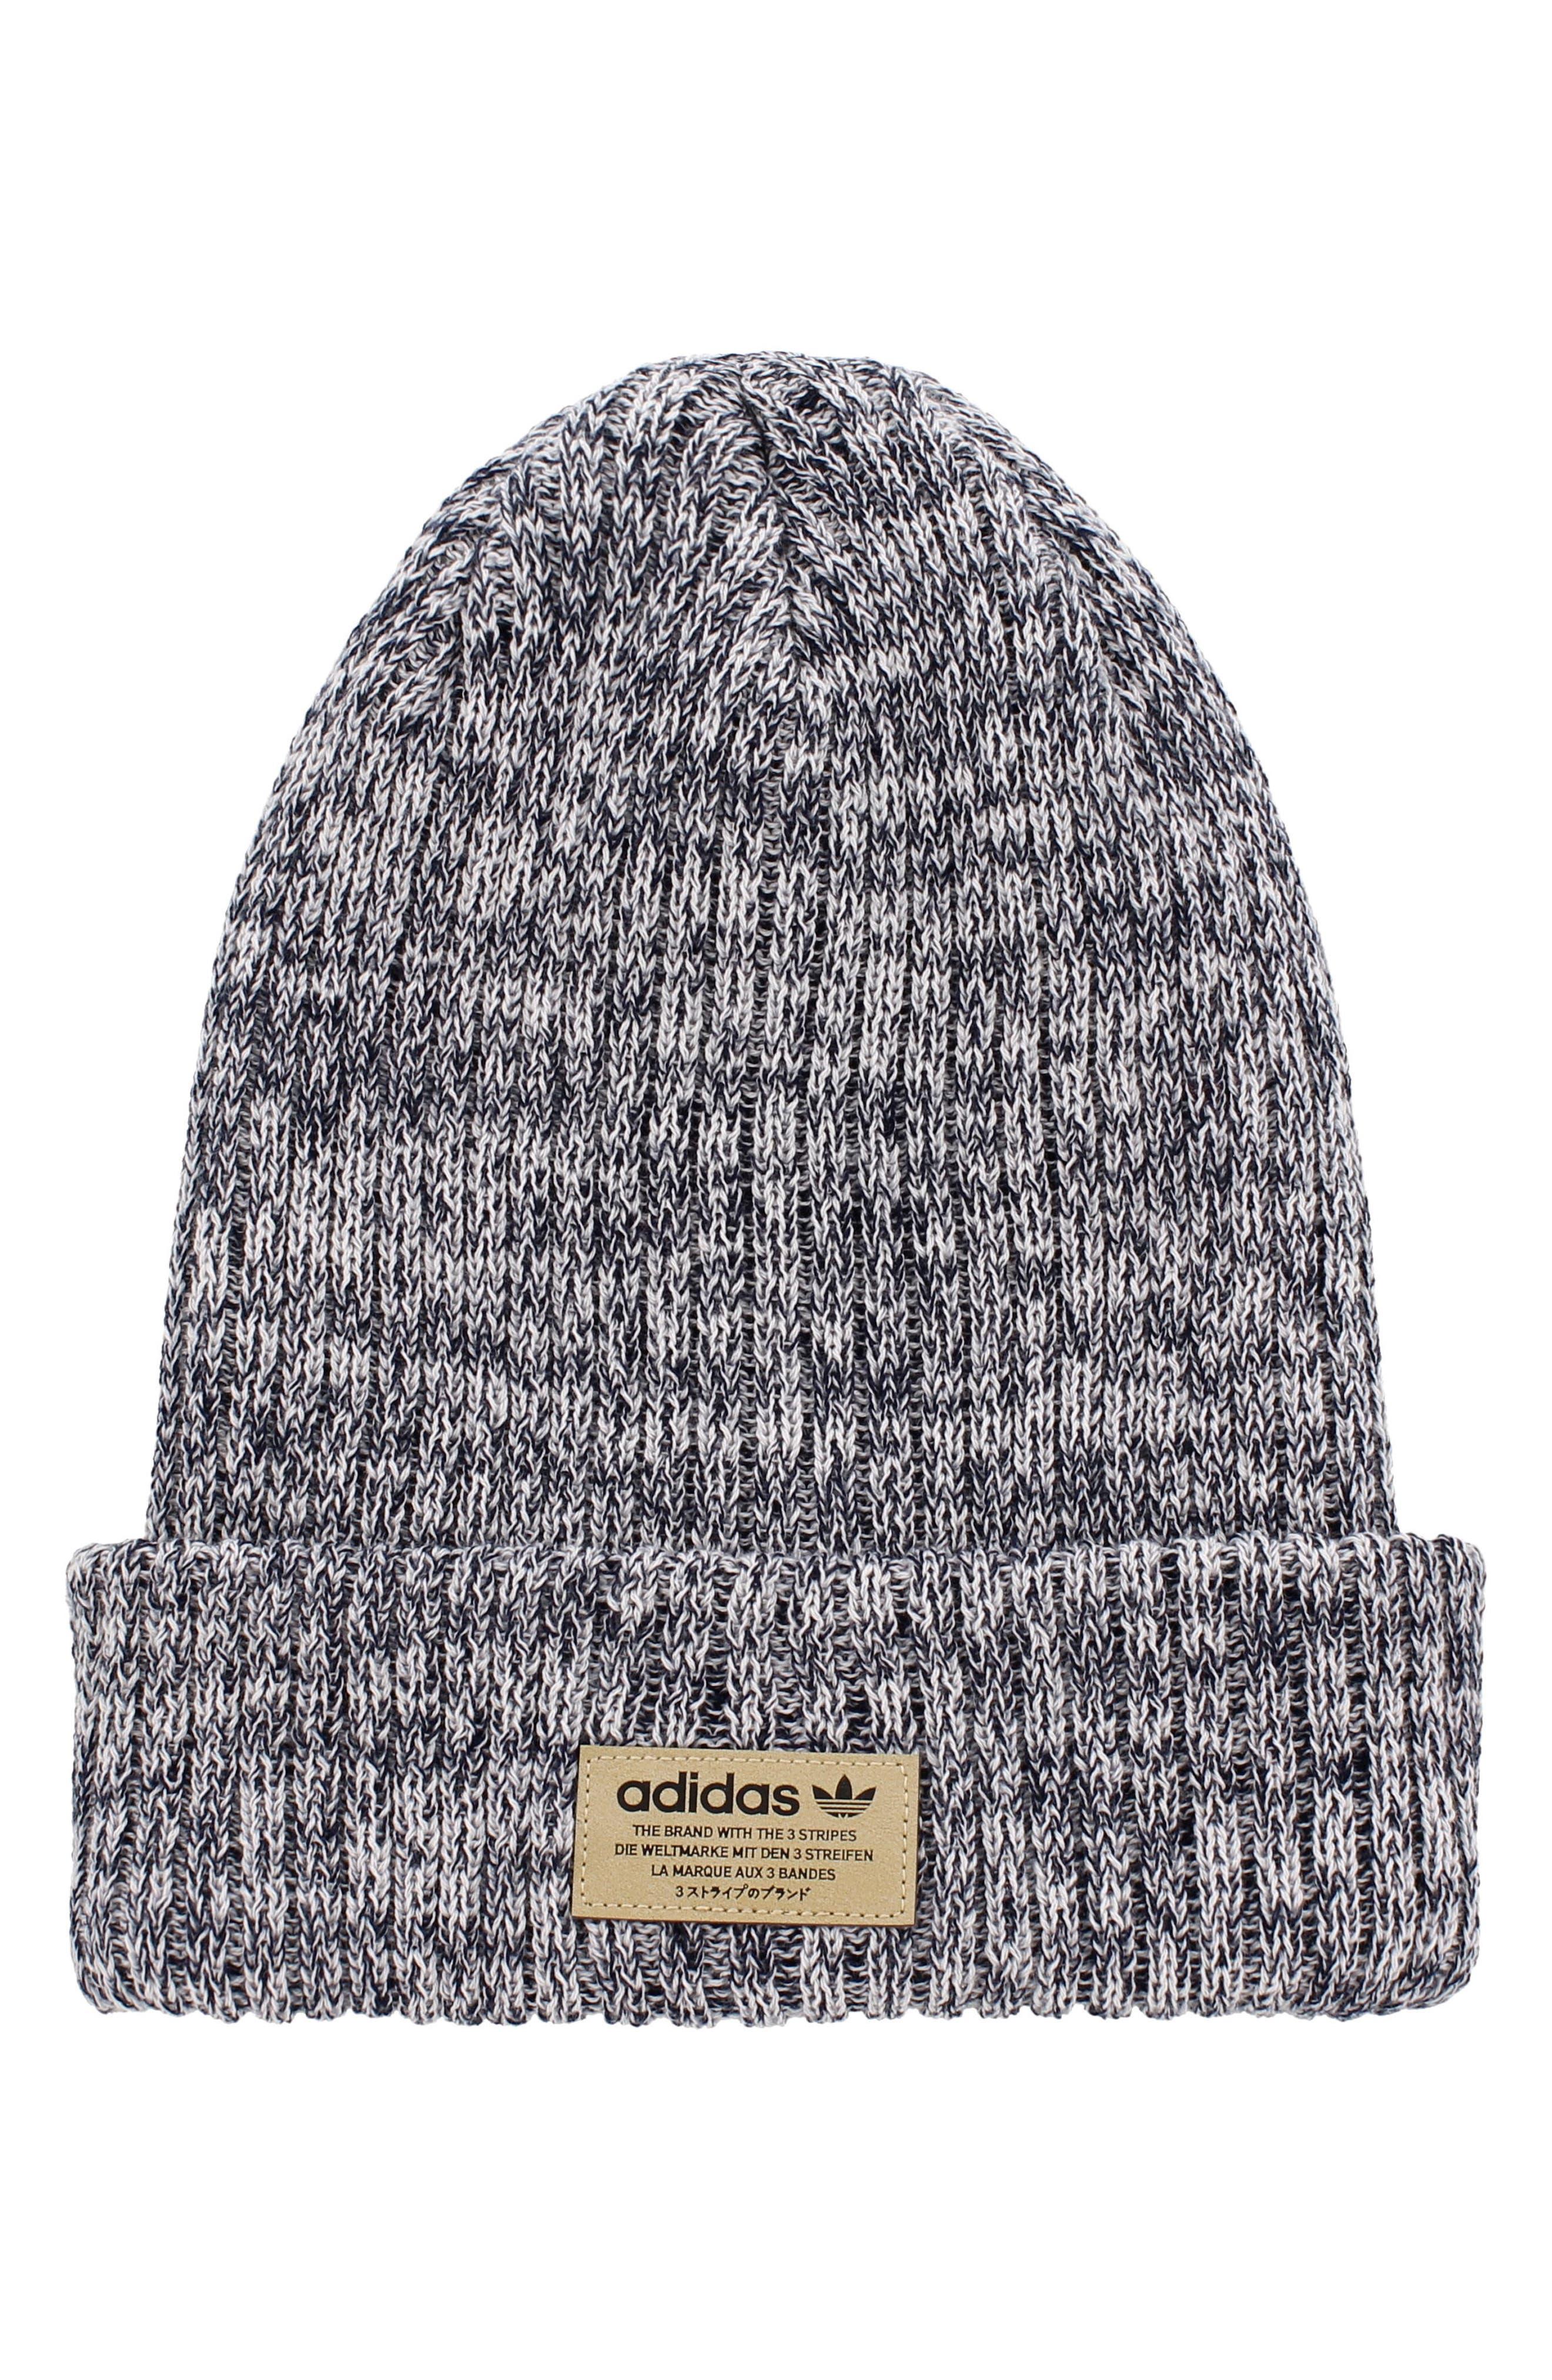 Alternate Image 1 Selected - adidas Originals NMD Knit Cap